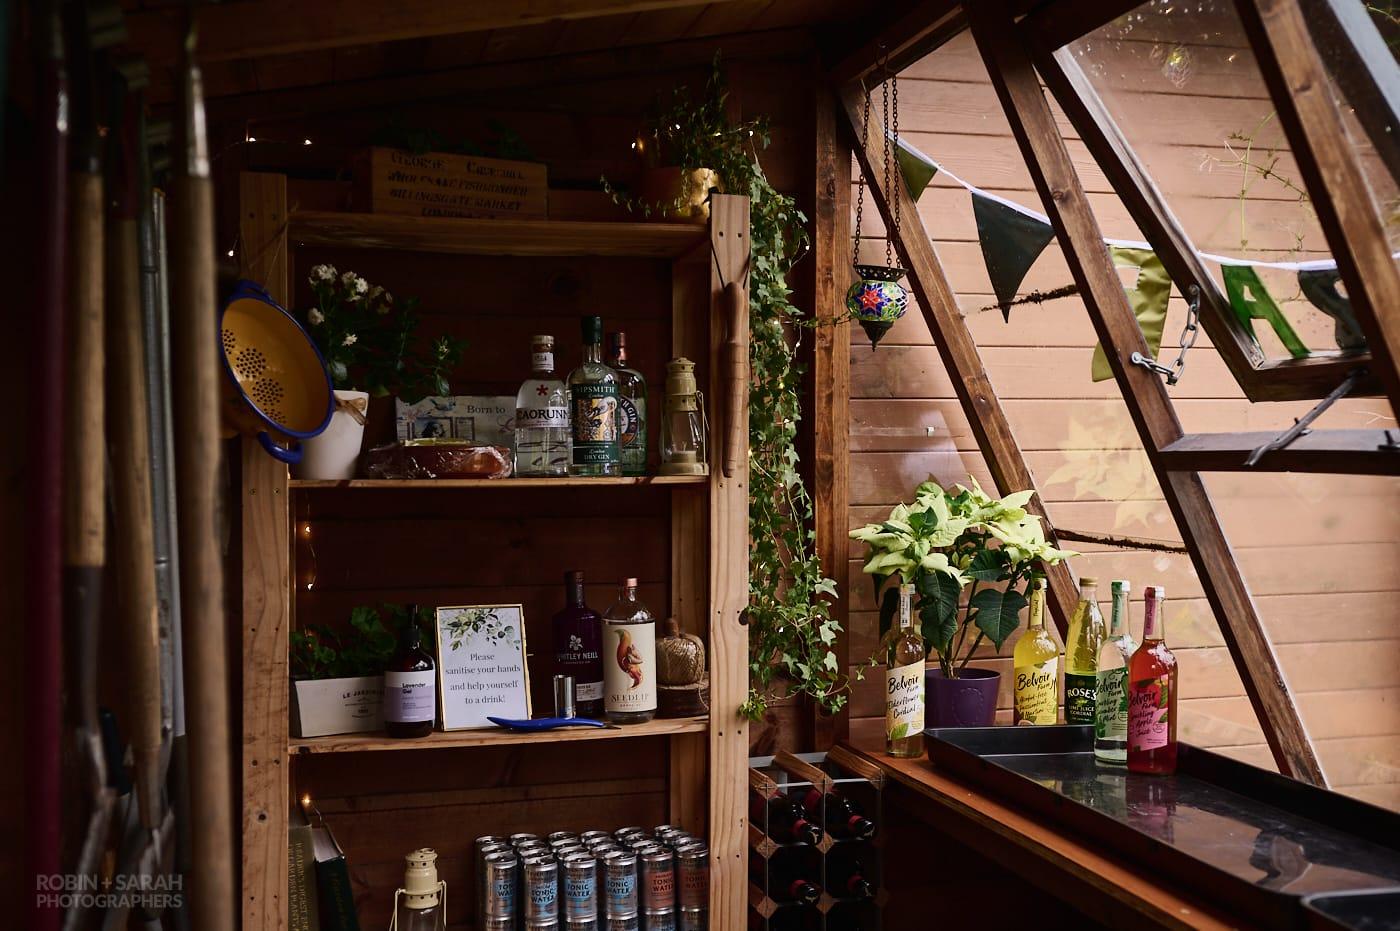 Makeshift bar set up in garden shed for home wedding